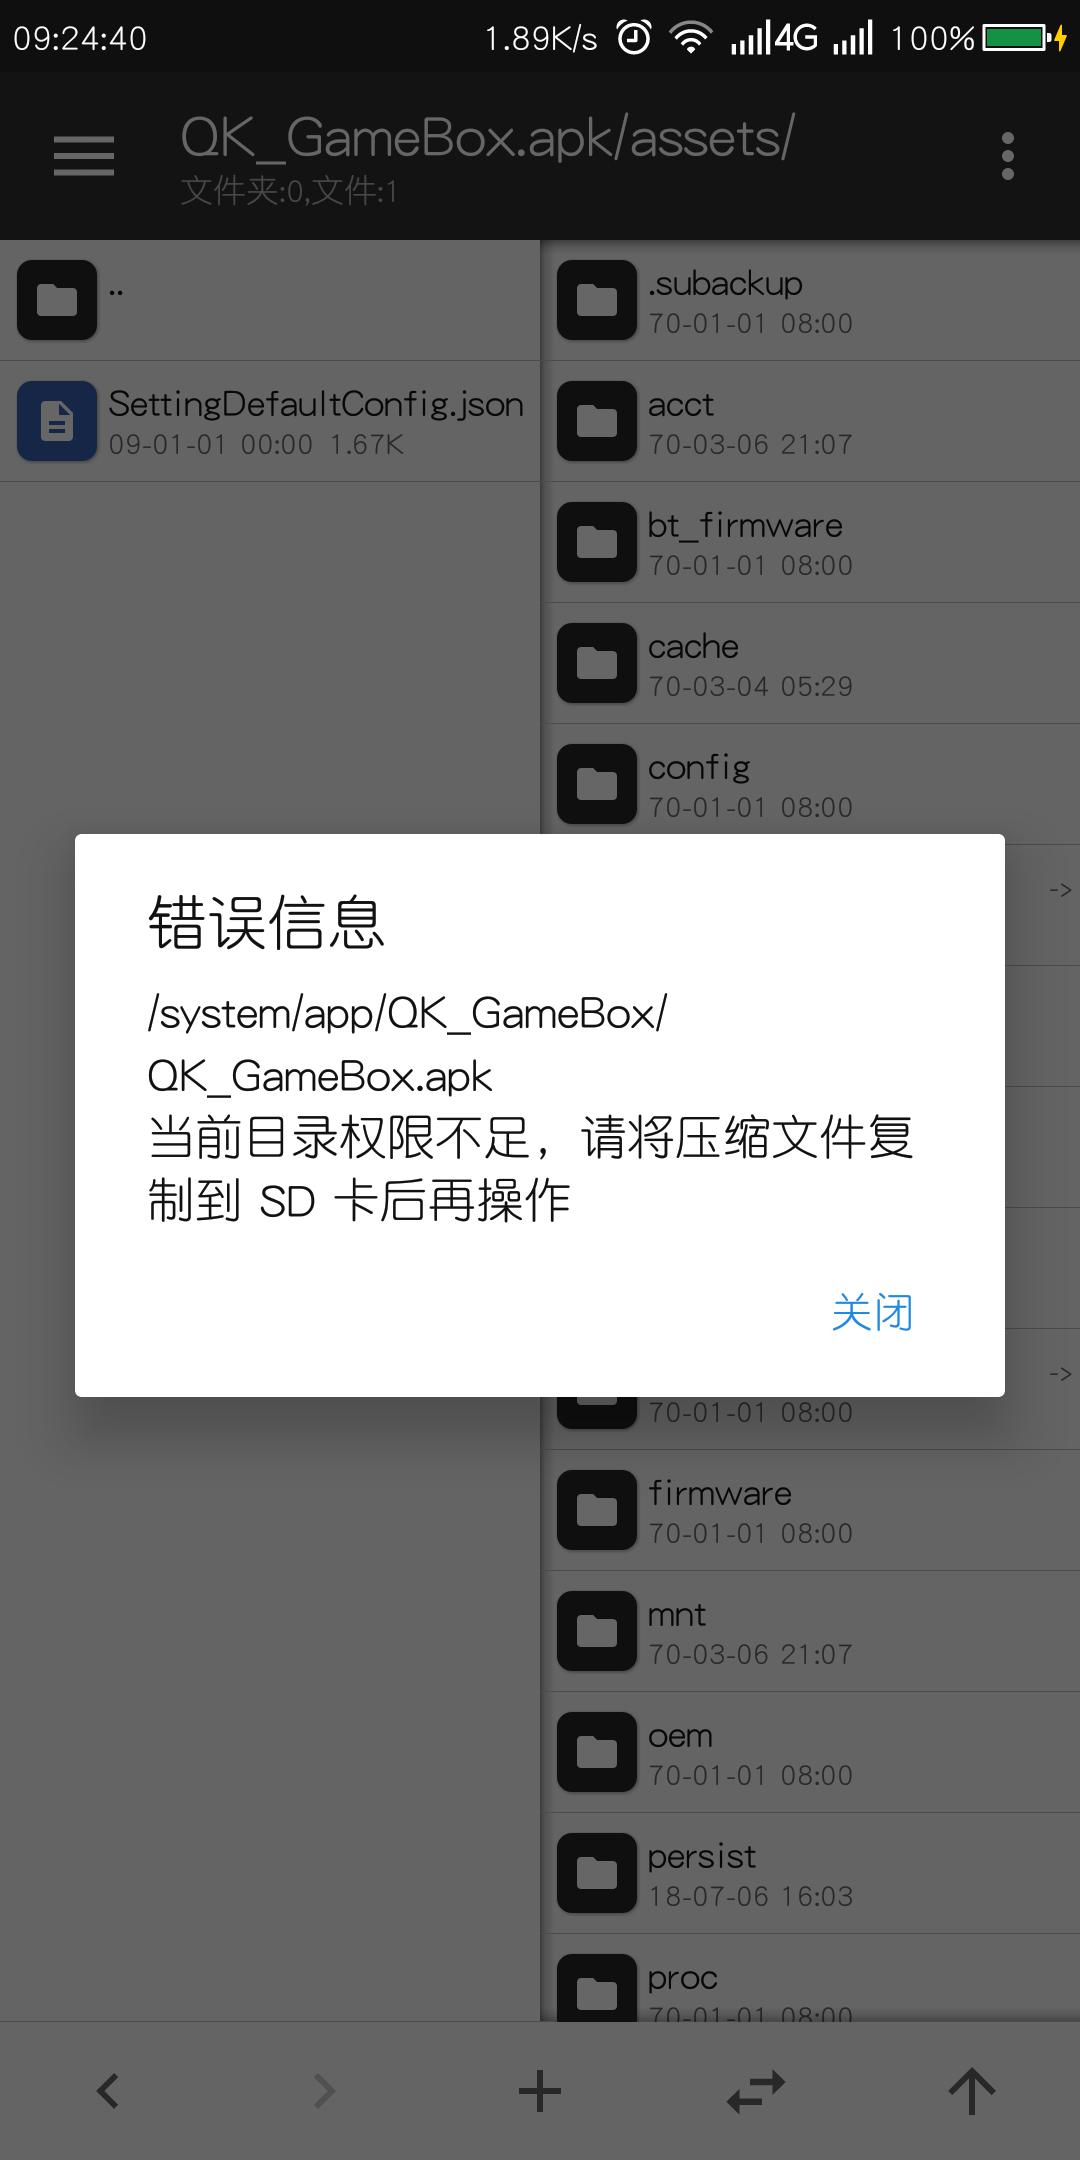 Screenshot_2018-07-12-09-24-41.png